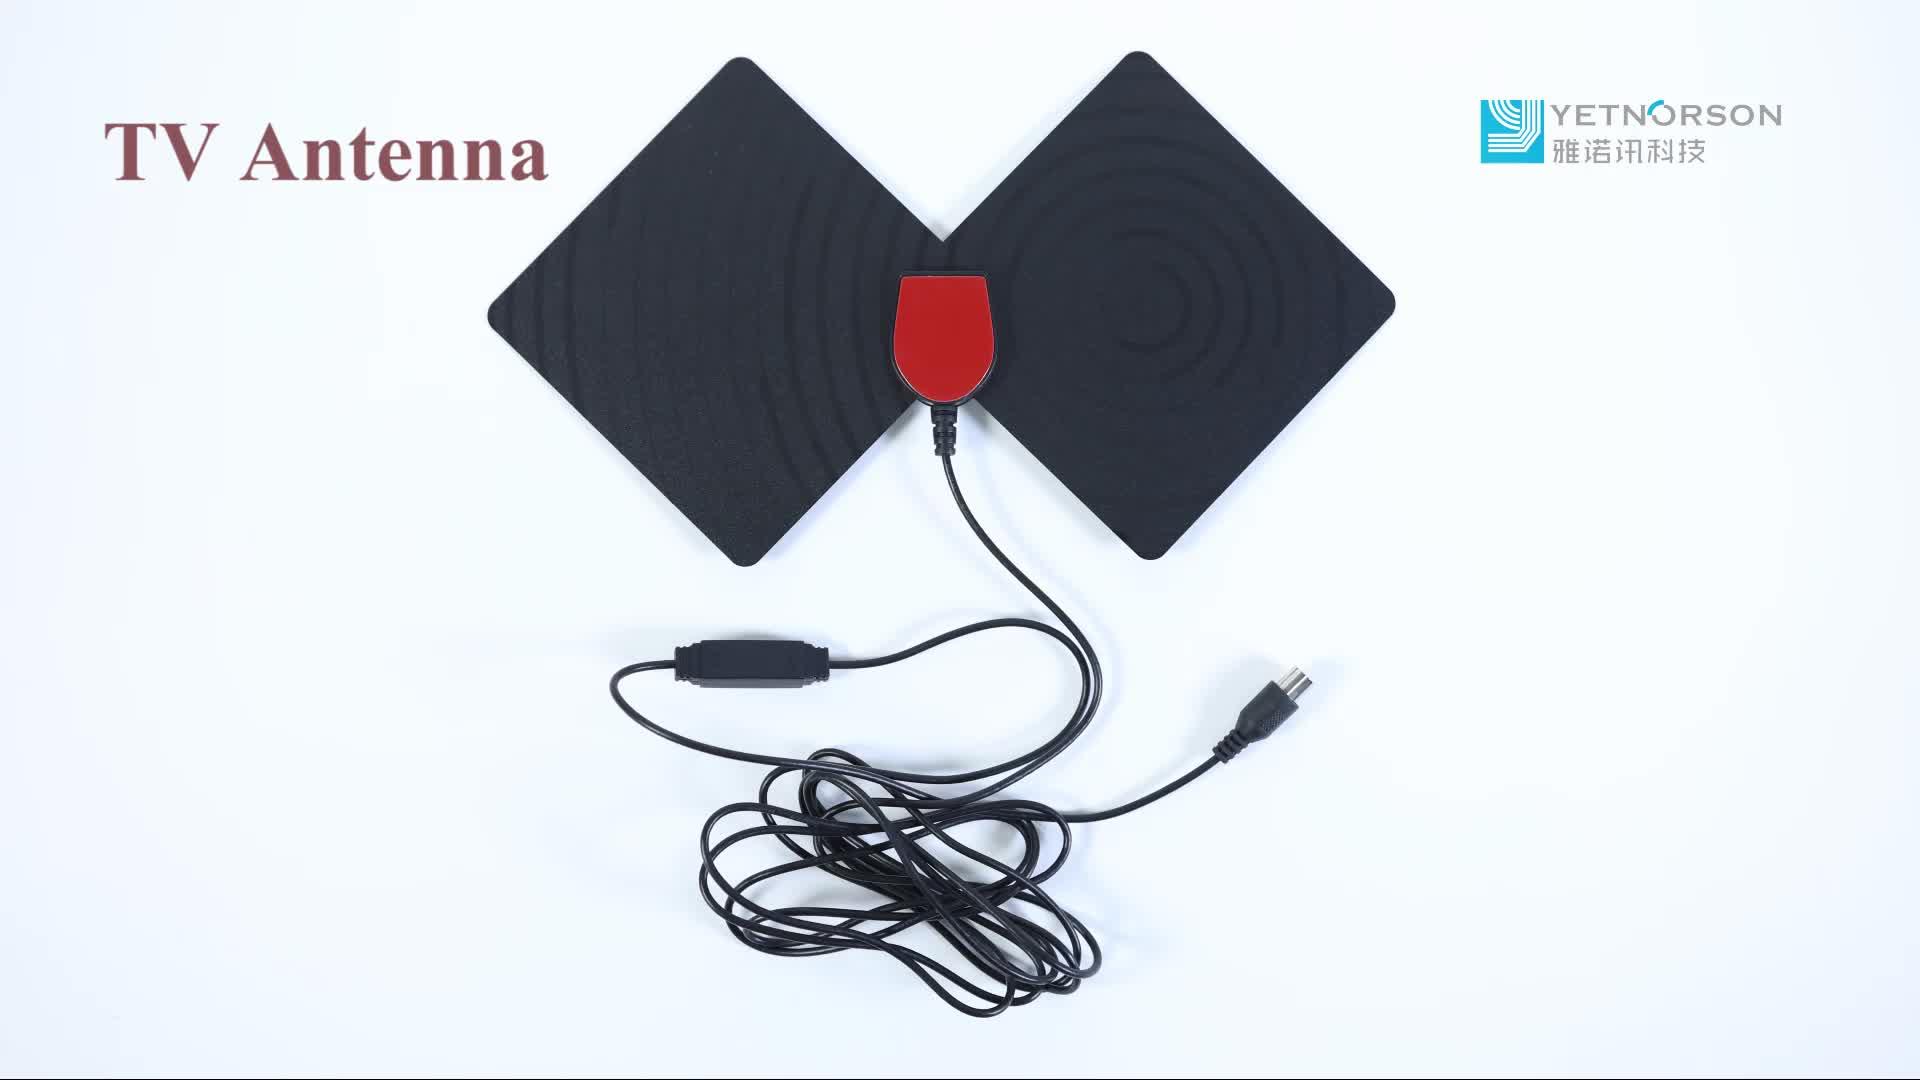 Esterna Impermeabile Digital TV DVBT Antenna Attiva con 3M RG174 Cavo Ubiquity Vendite Calde